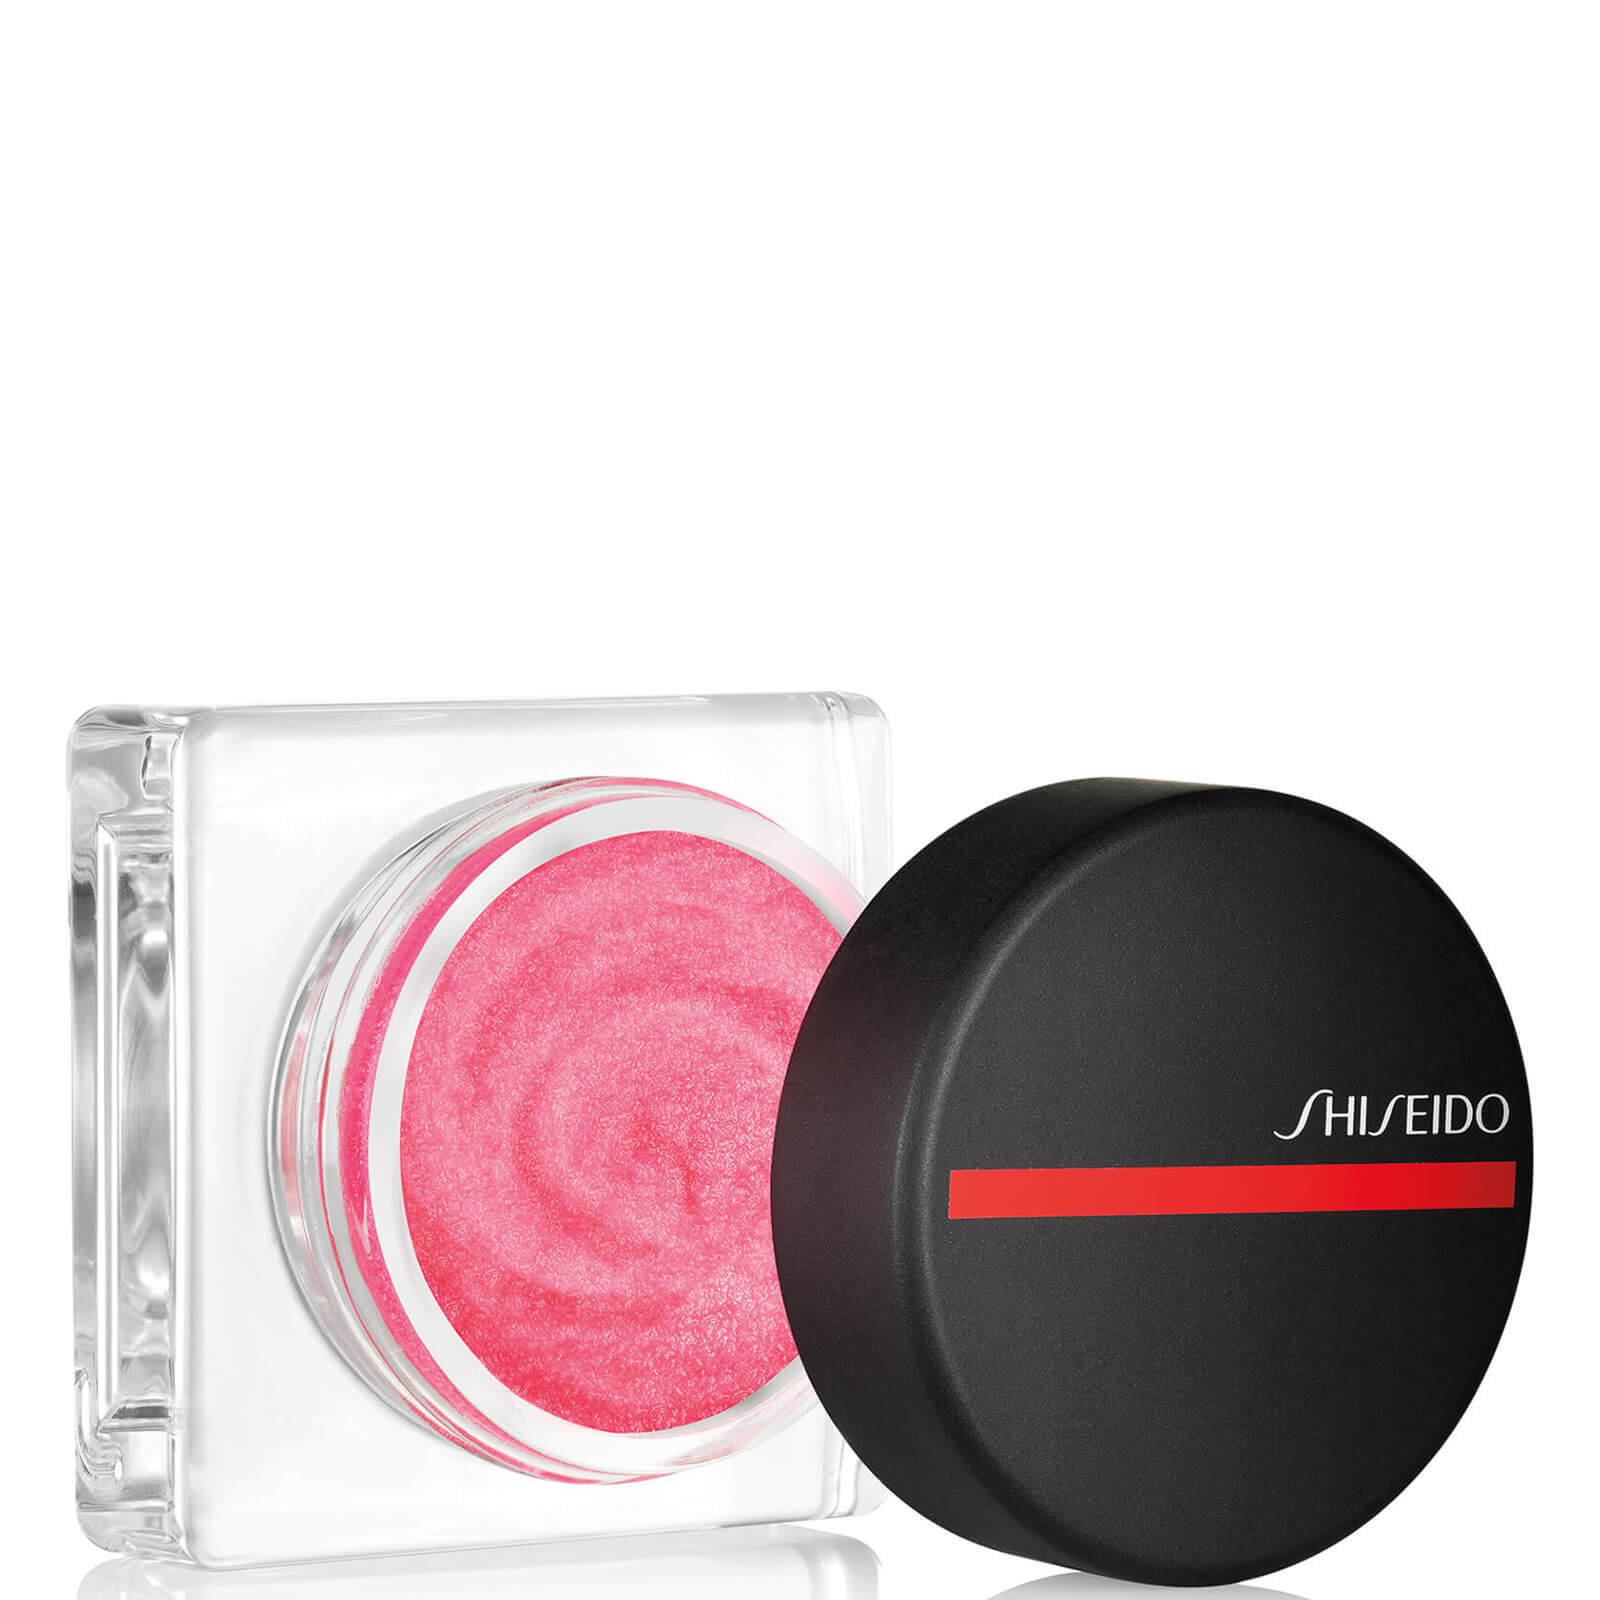 Купить Румяна-вуаль Shiseido Minimalist Whipped Powder Blush (различные оттенки) - Blush Chiyoko 02